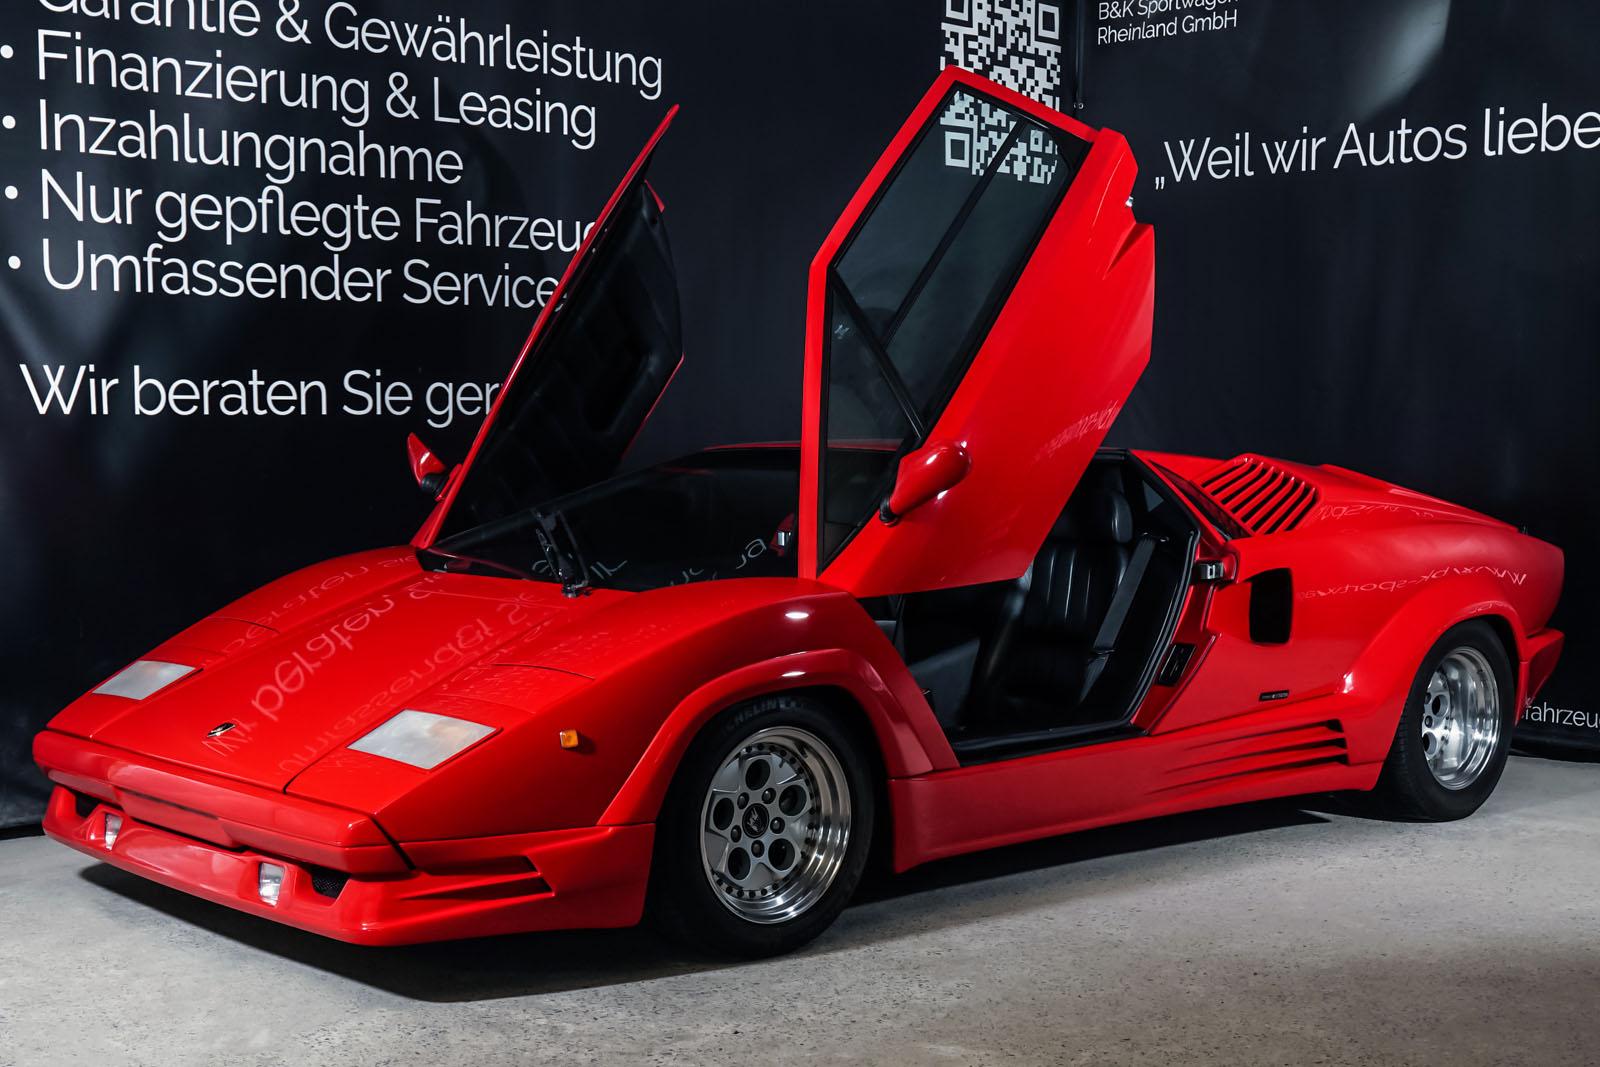 Lamborghini_Countach_Rot_Schwarz_LAM-2811_3_w